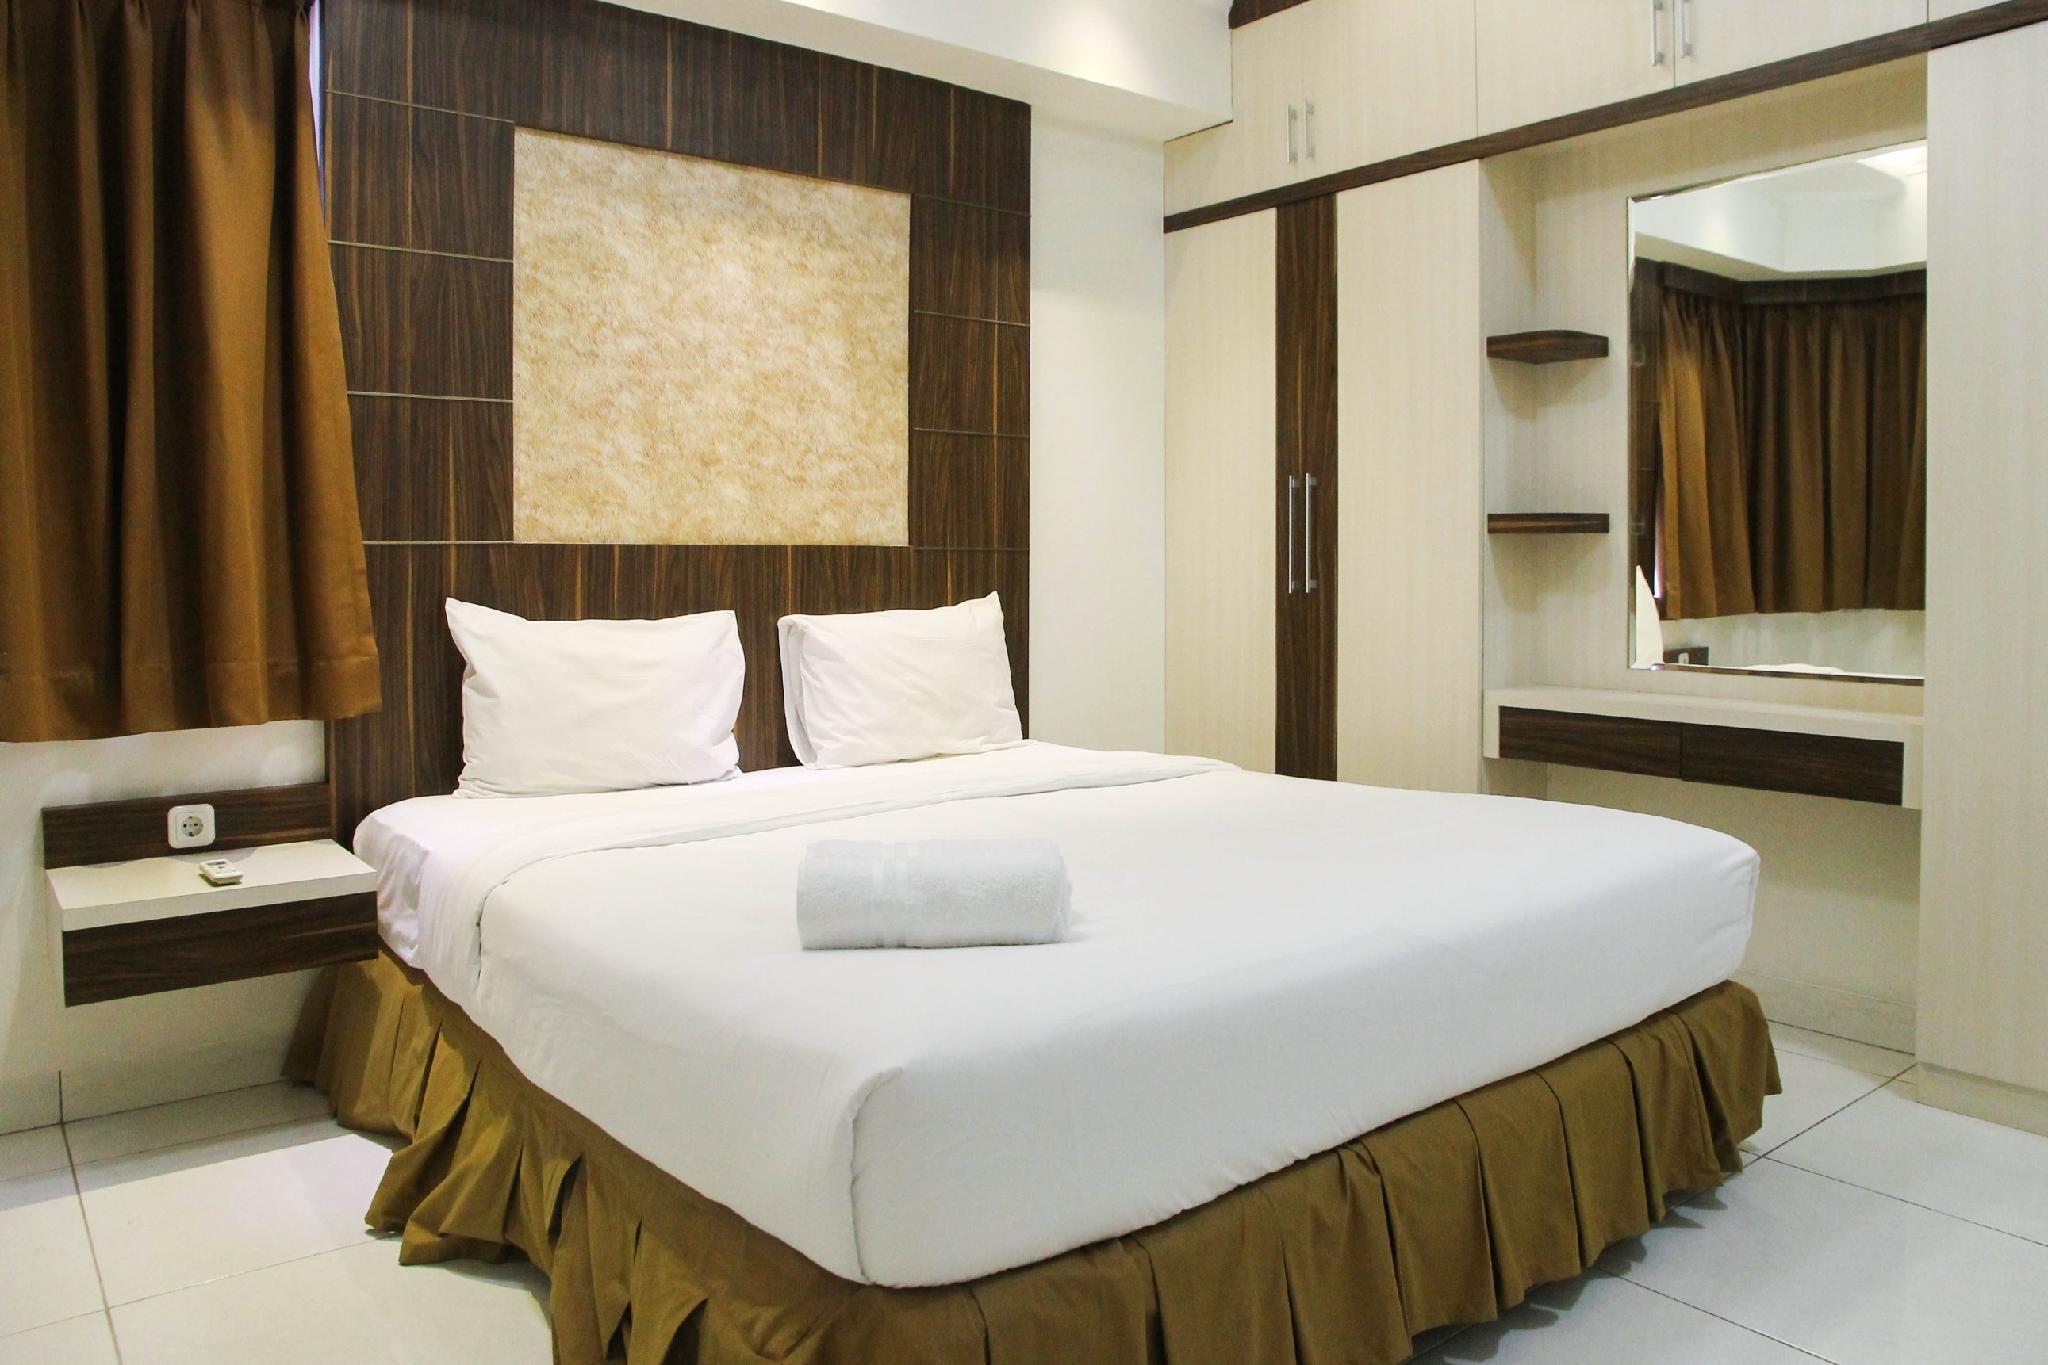 3BR City View Sudirman Condominium Apt By Travelio